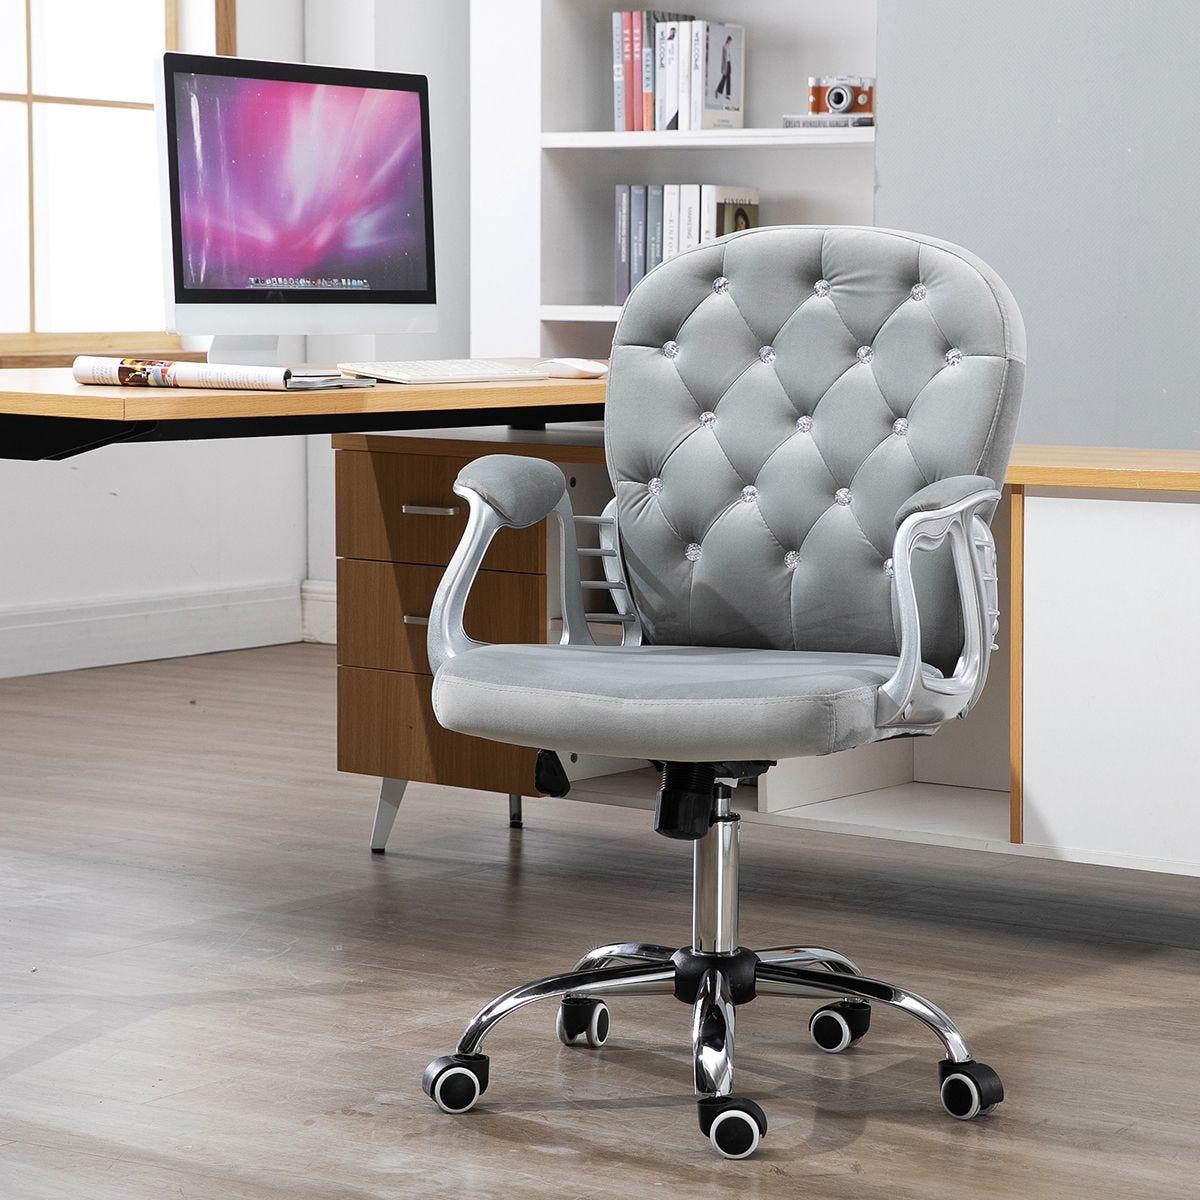 Office Chair Luxury Velour Diamante Tufted Padded Ergonomic 360 Swivel Grey